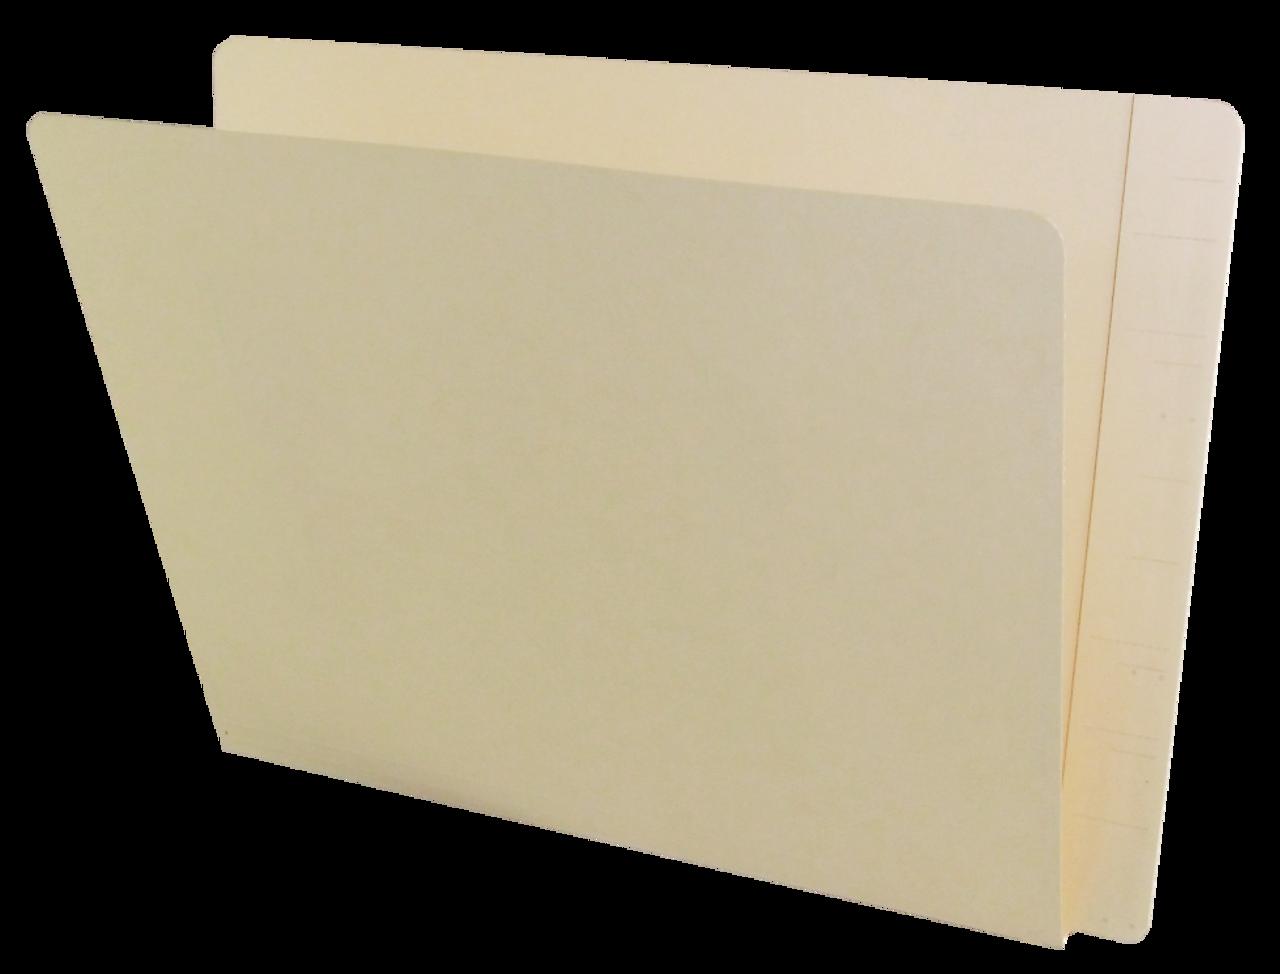 1 1//2 Accordion Expansion Sold as 1 Box Legal 50//Box 14 Point Manila End Tab File Pockets